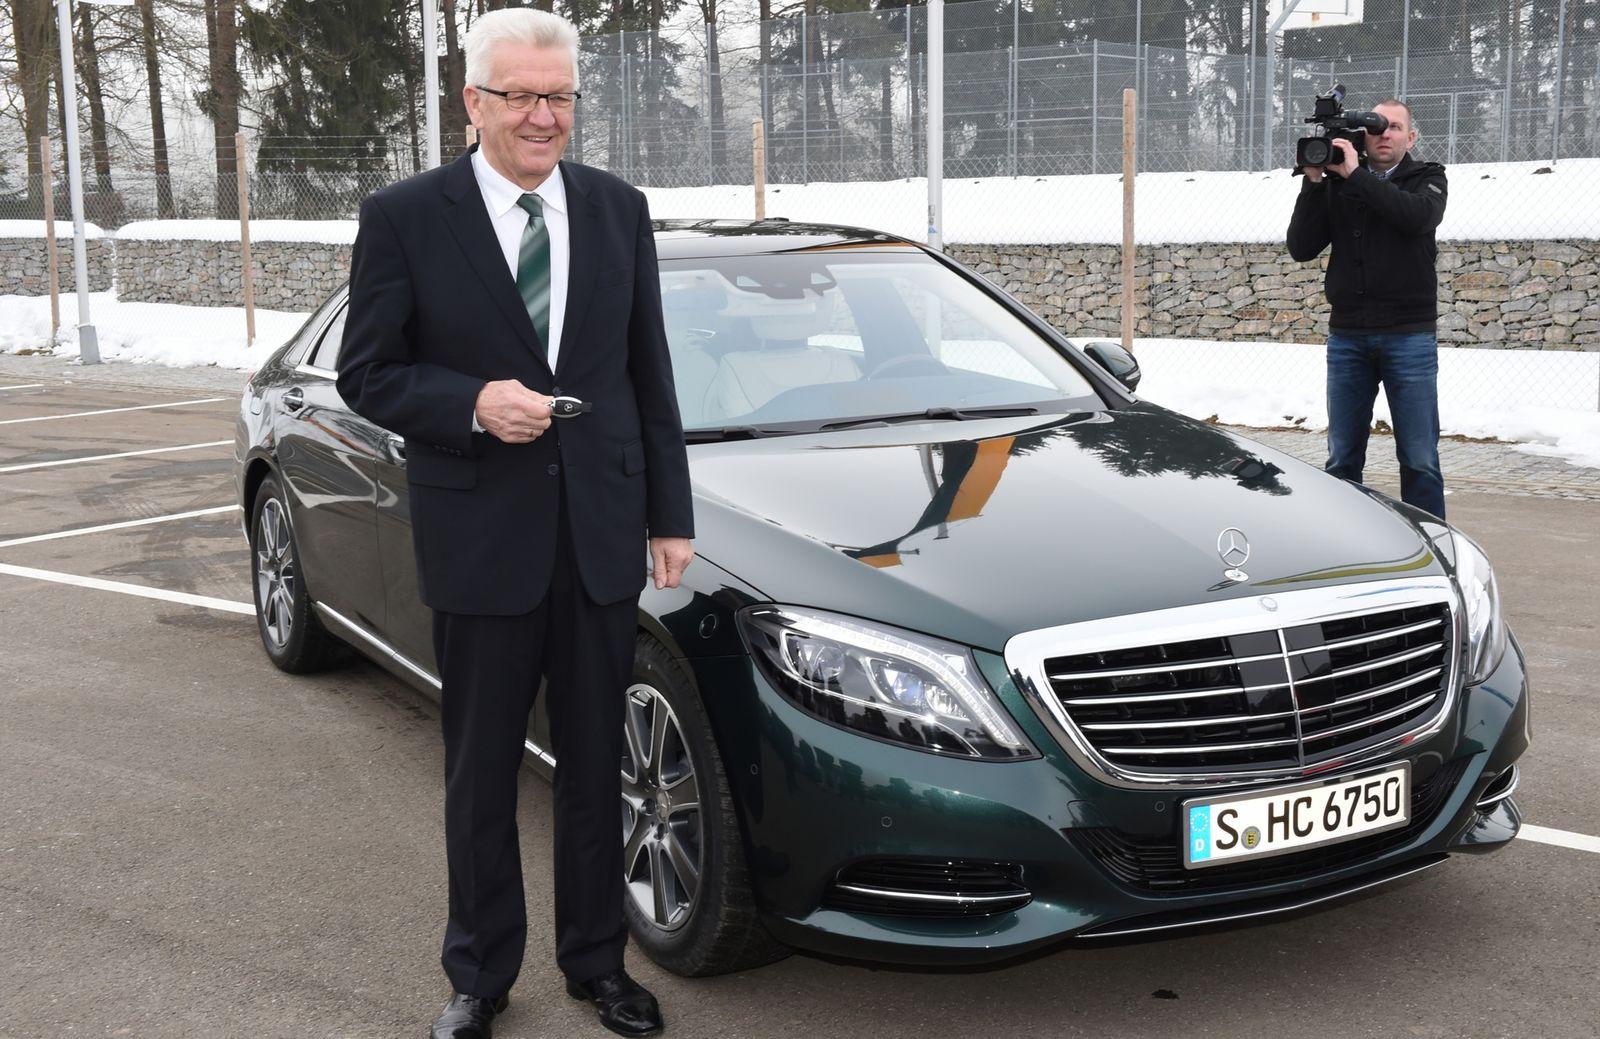 Winfried Kretschmann / Dienstwagen